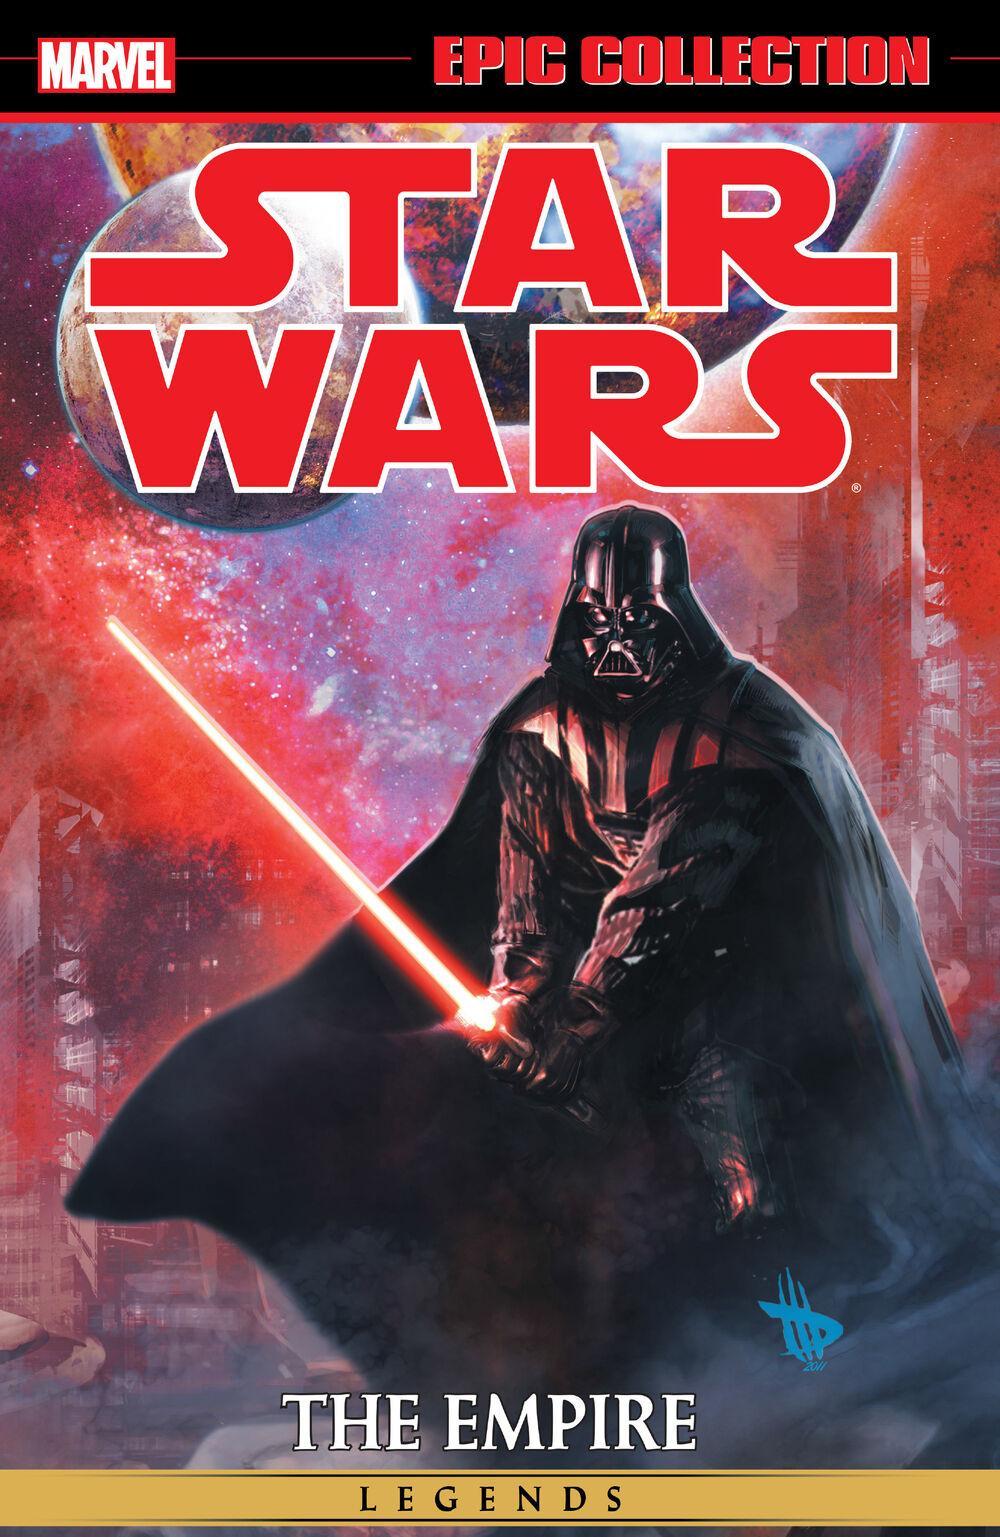 Star Wars Legends Epic Collection VO - US 16_emp10